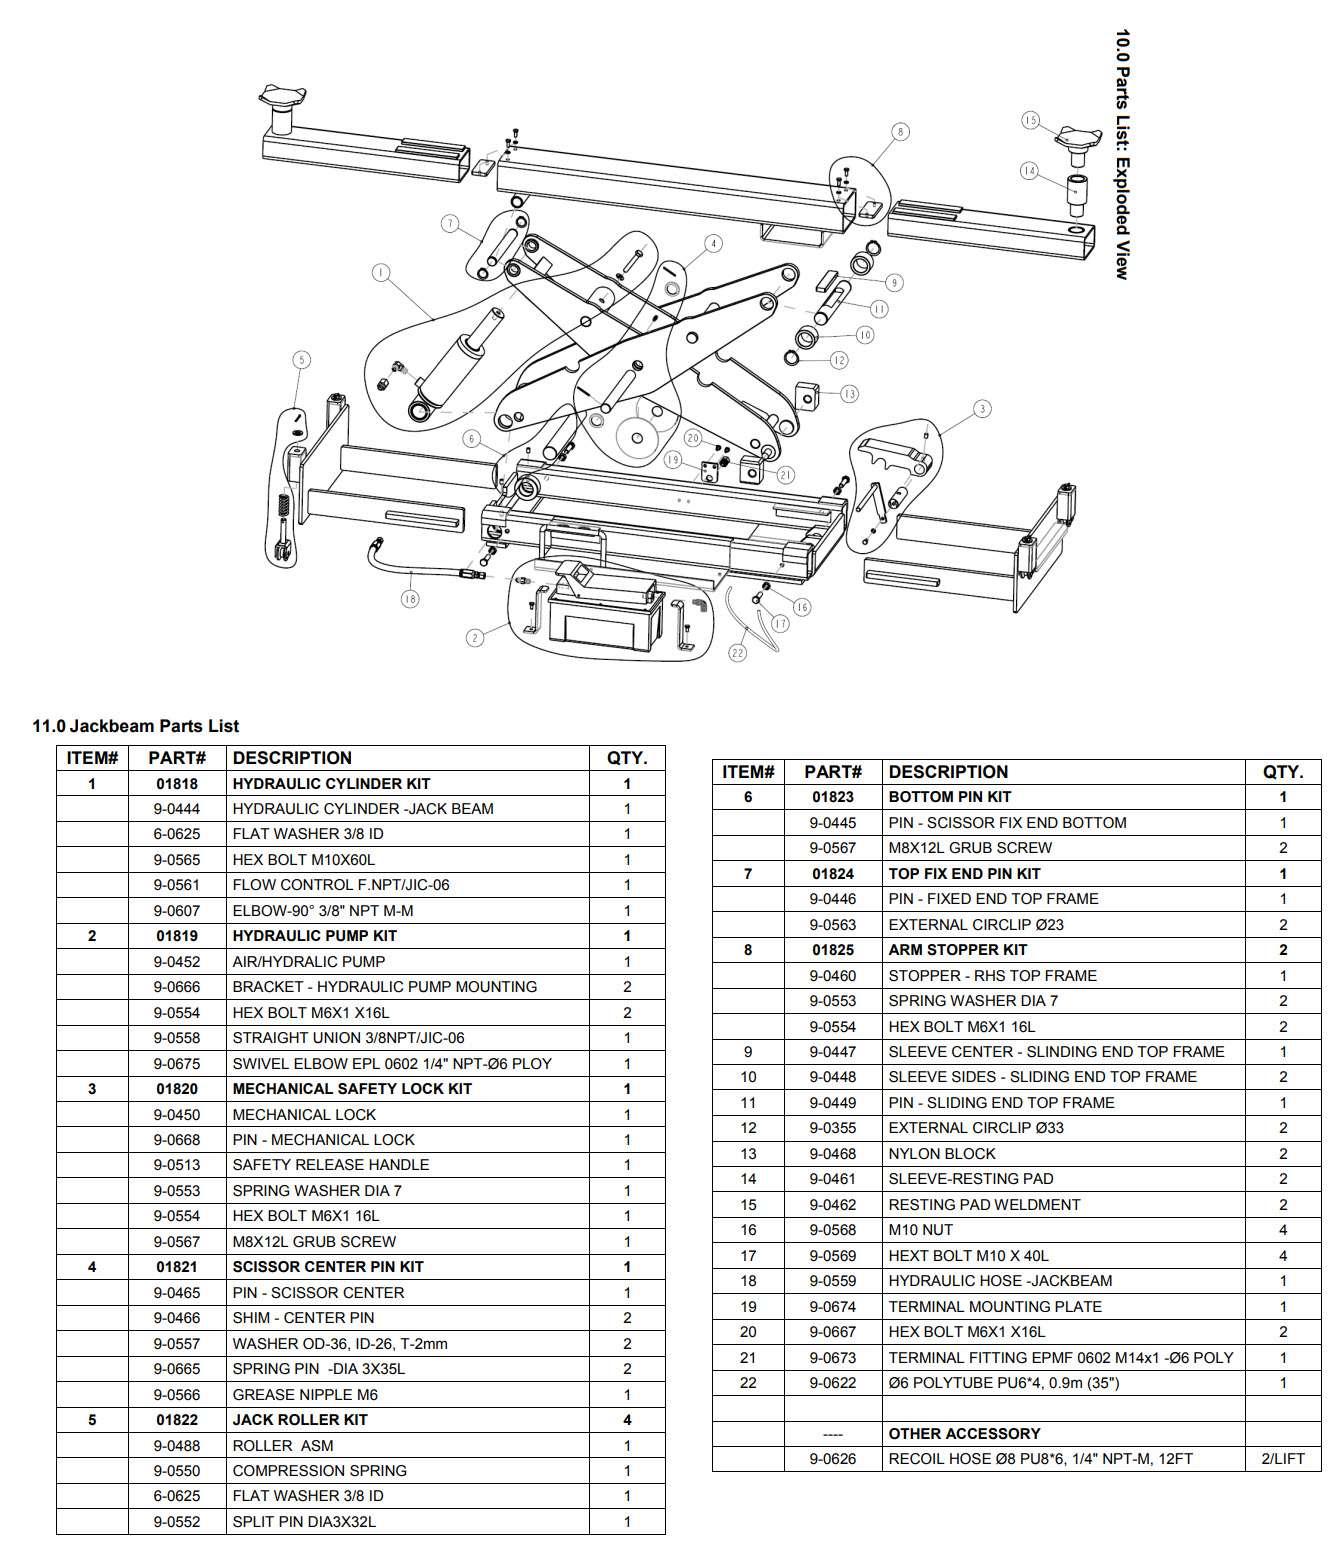 EELR512A parts breakdown